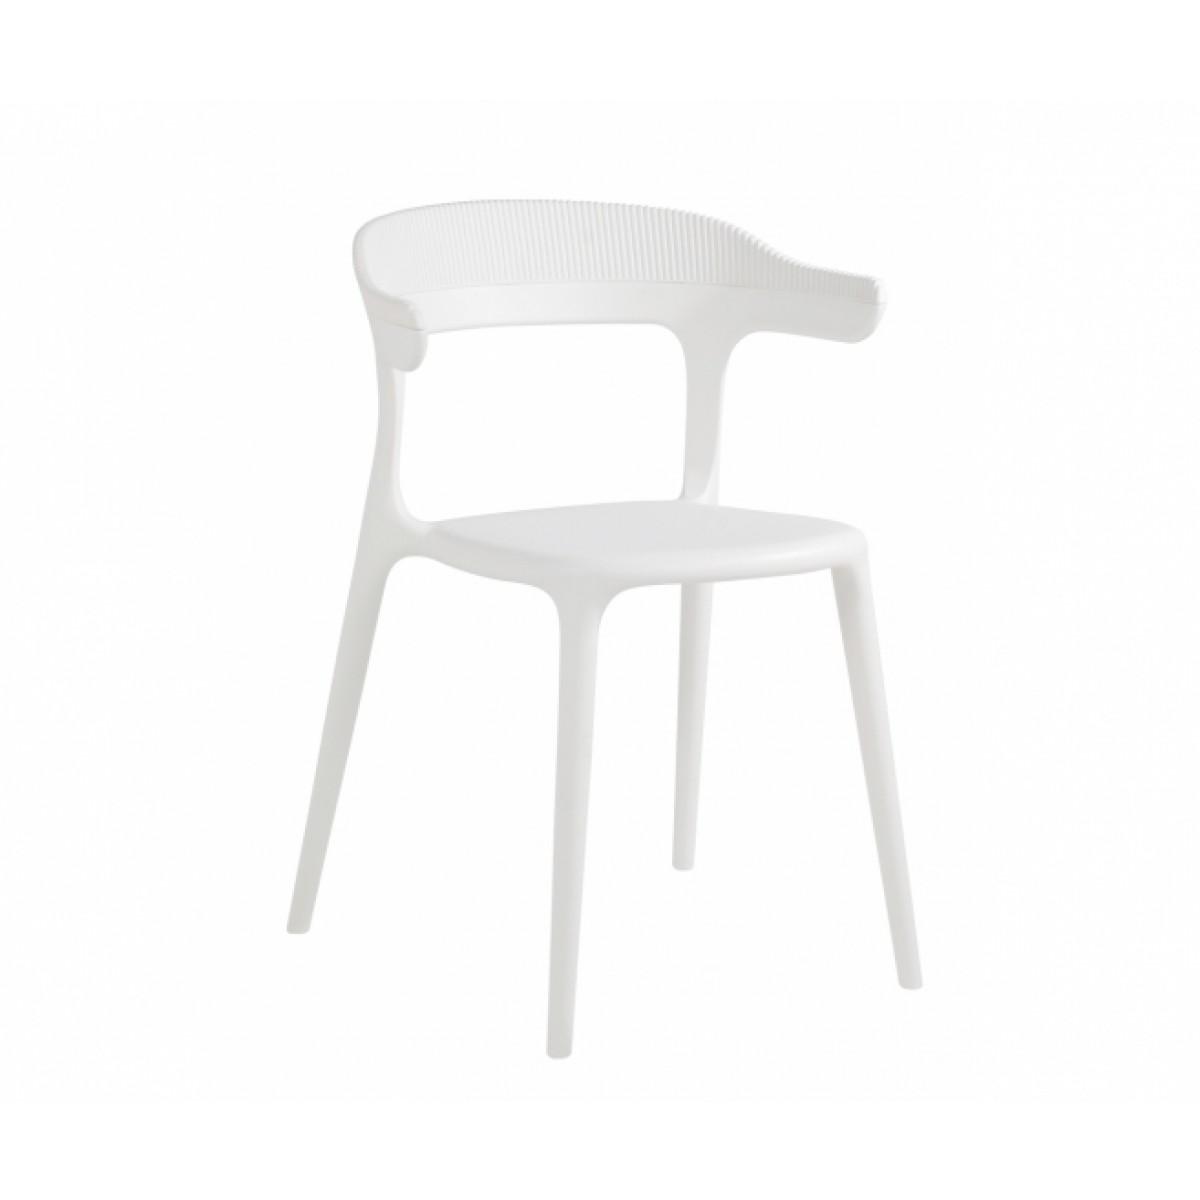 gartenstuhl wei stapelbar stuhl wei kunststoff. Black Bedroom Furniture Sets. Home Design Ideas